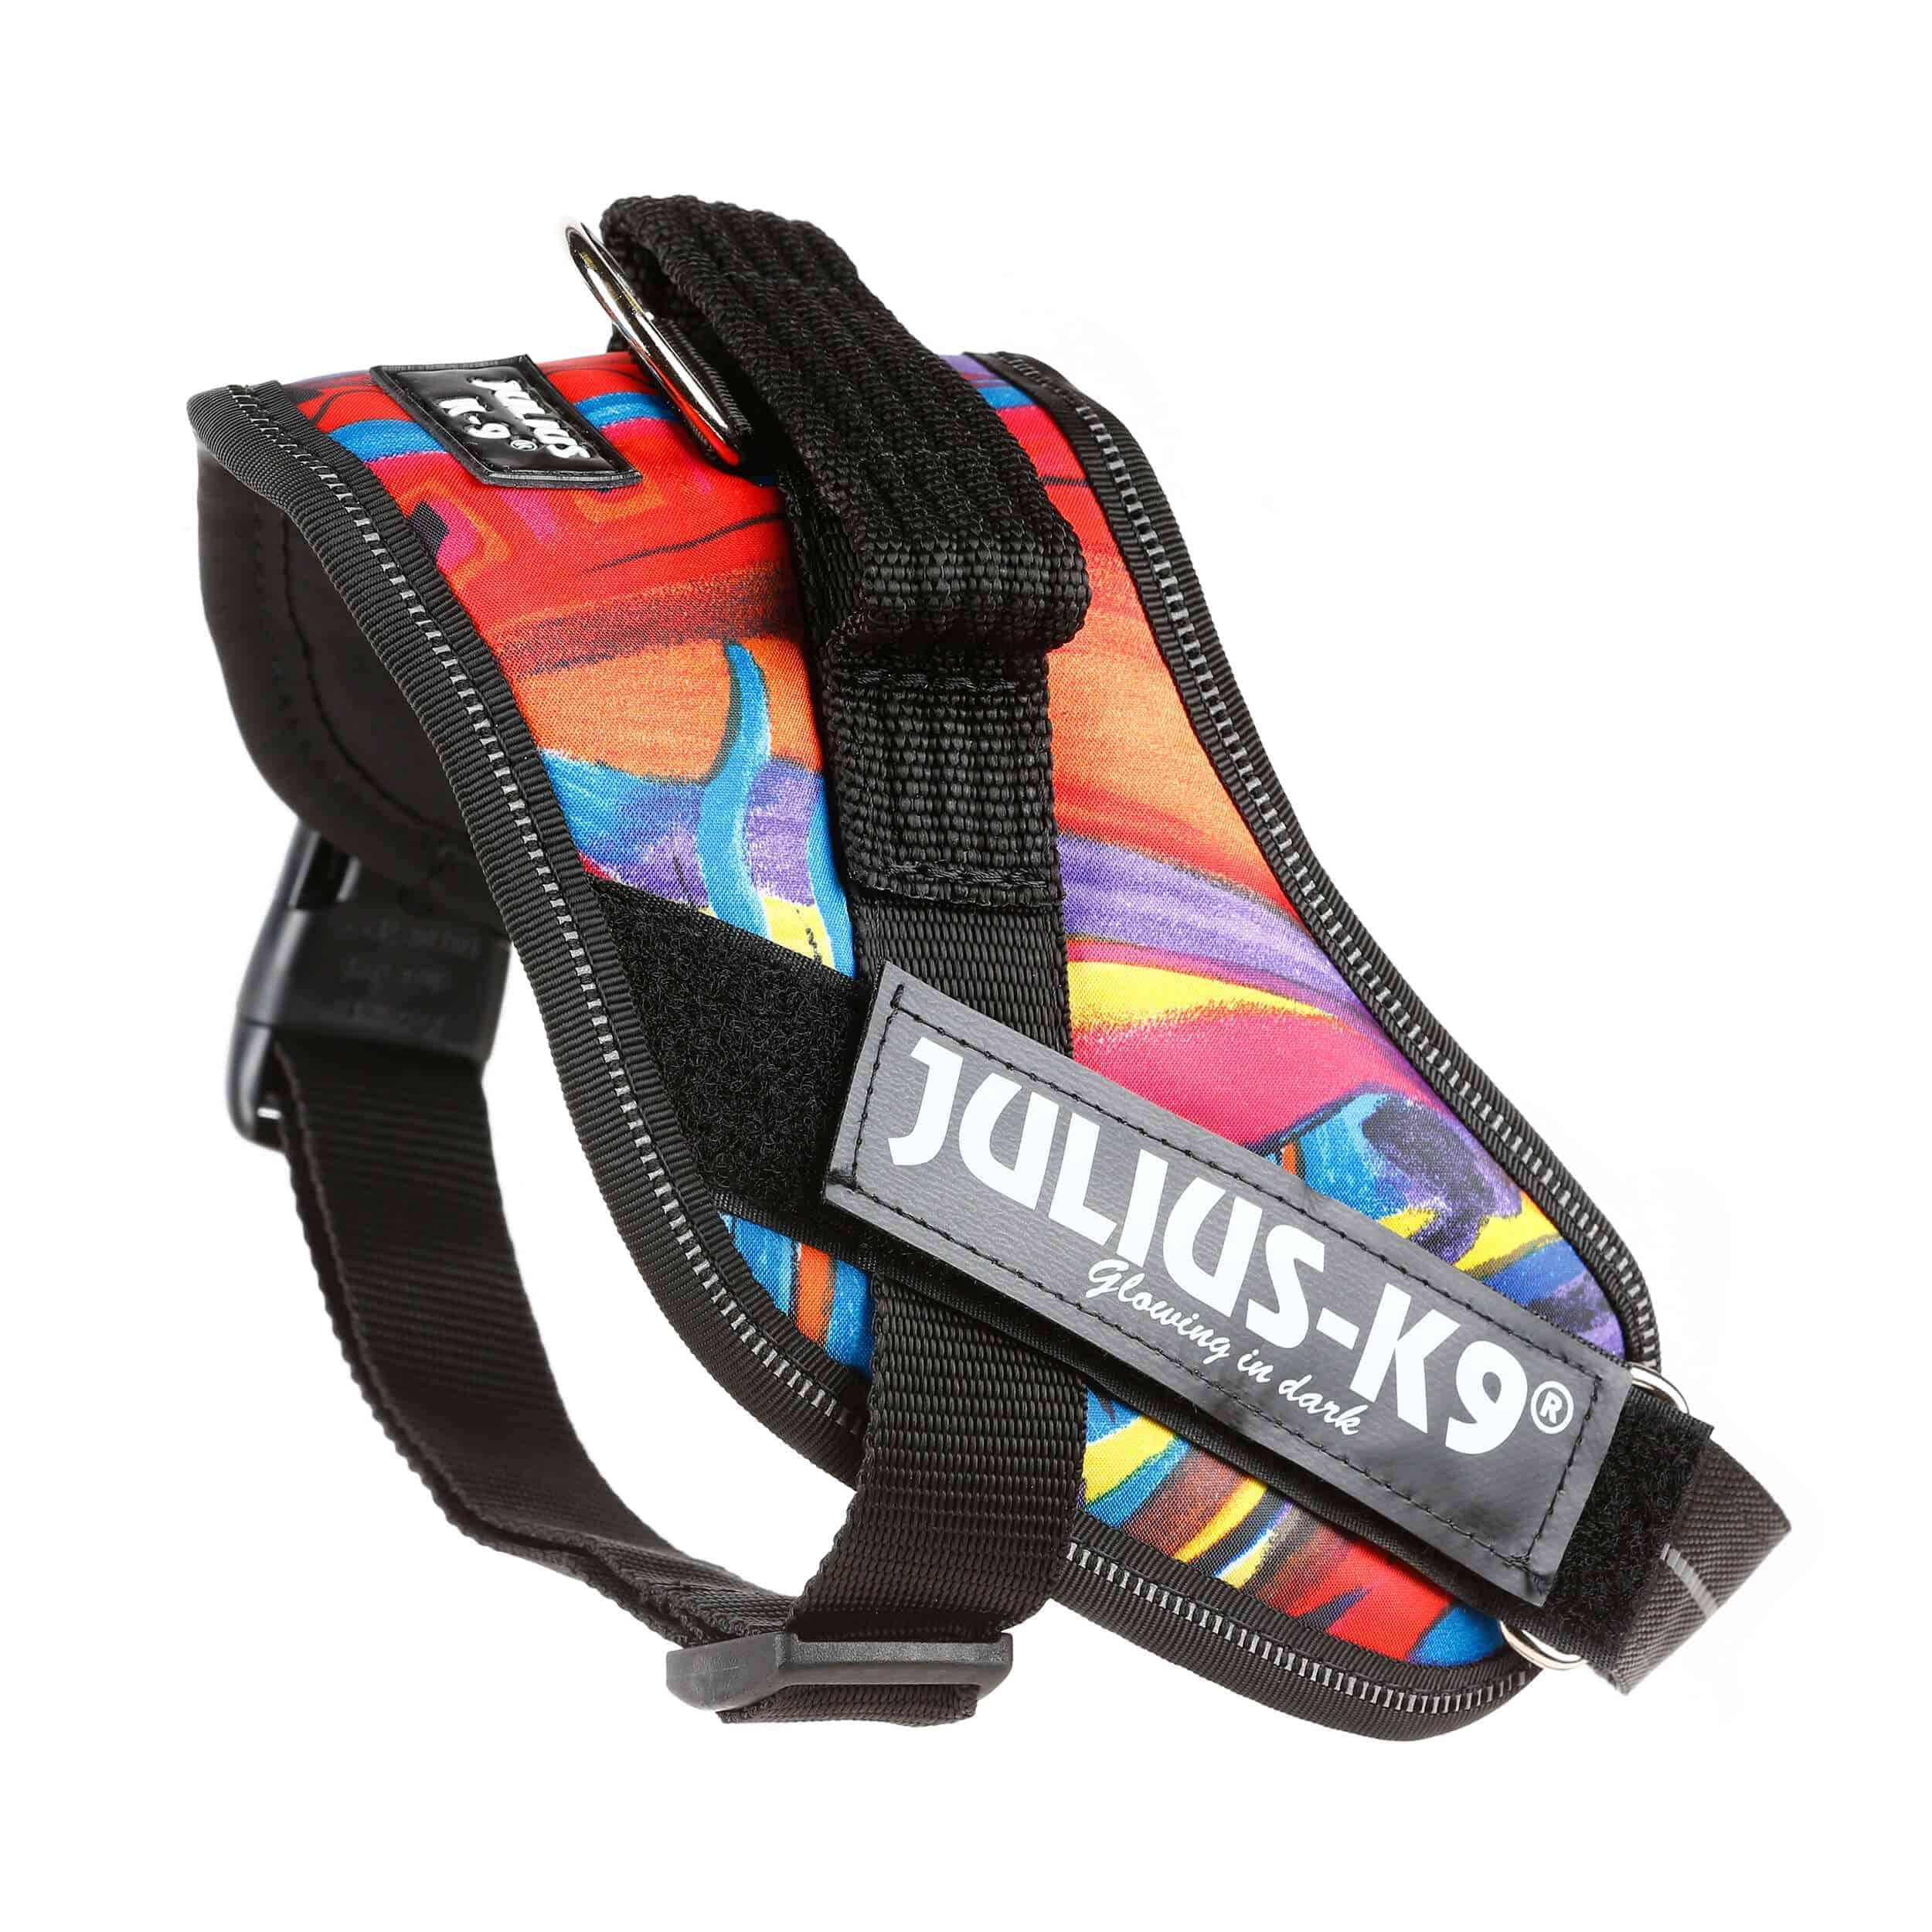 Julius-K9 16IDC Power Harness